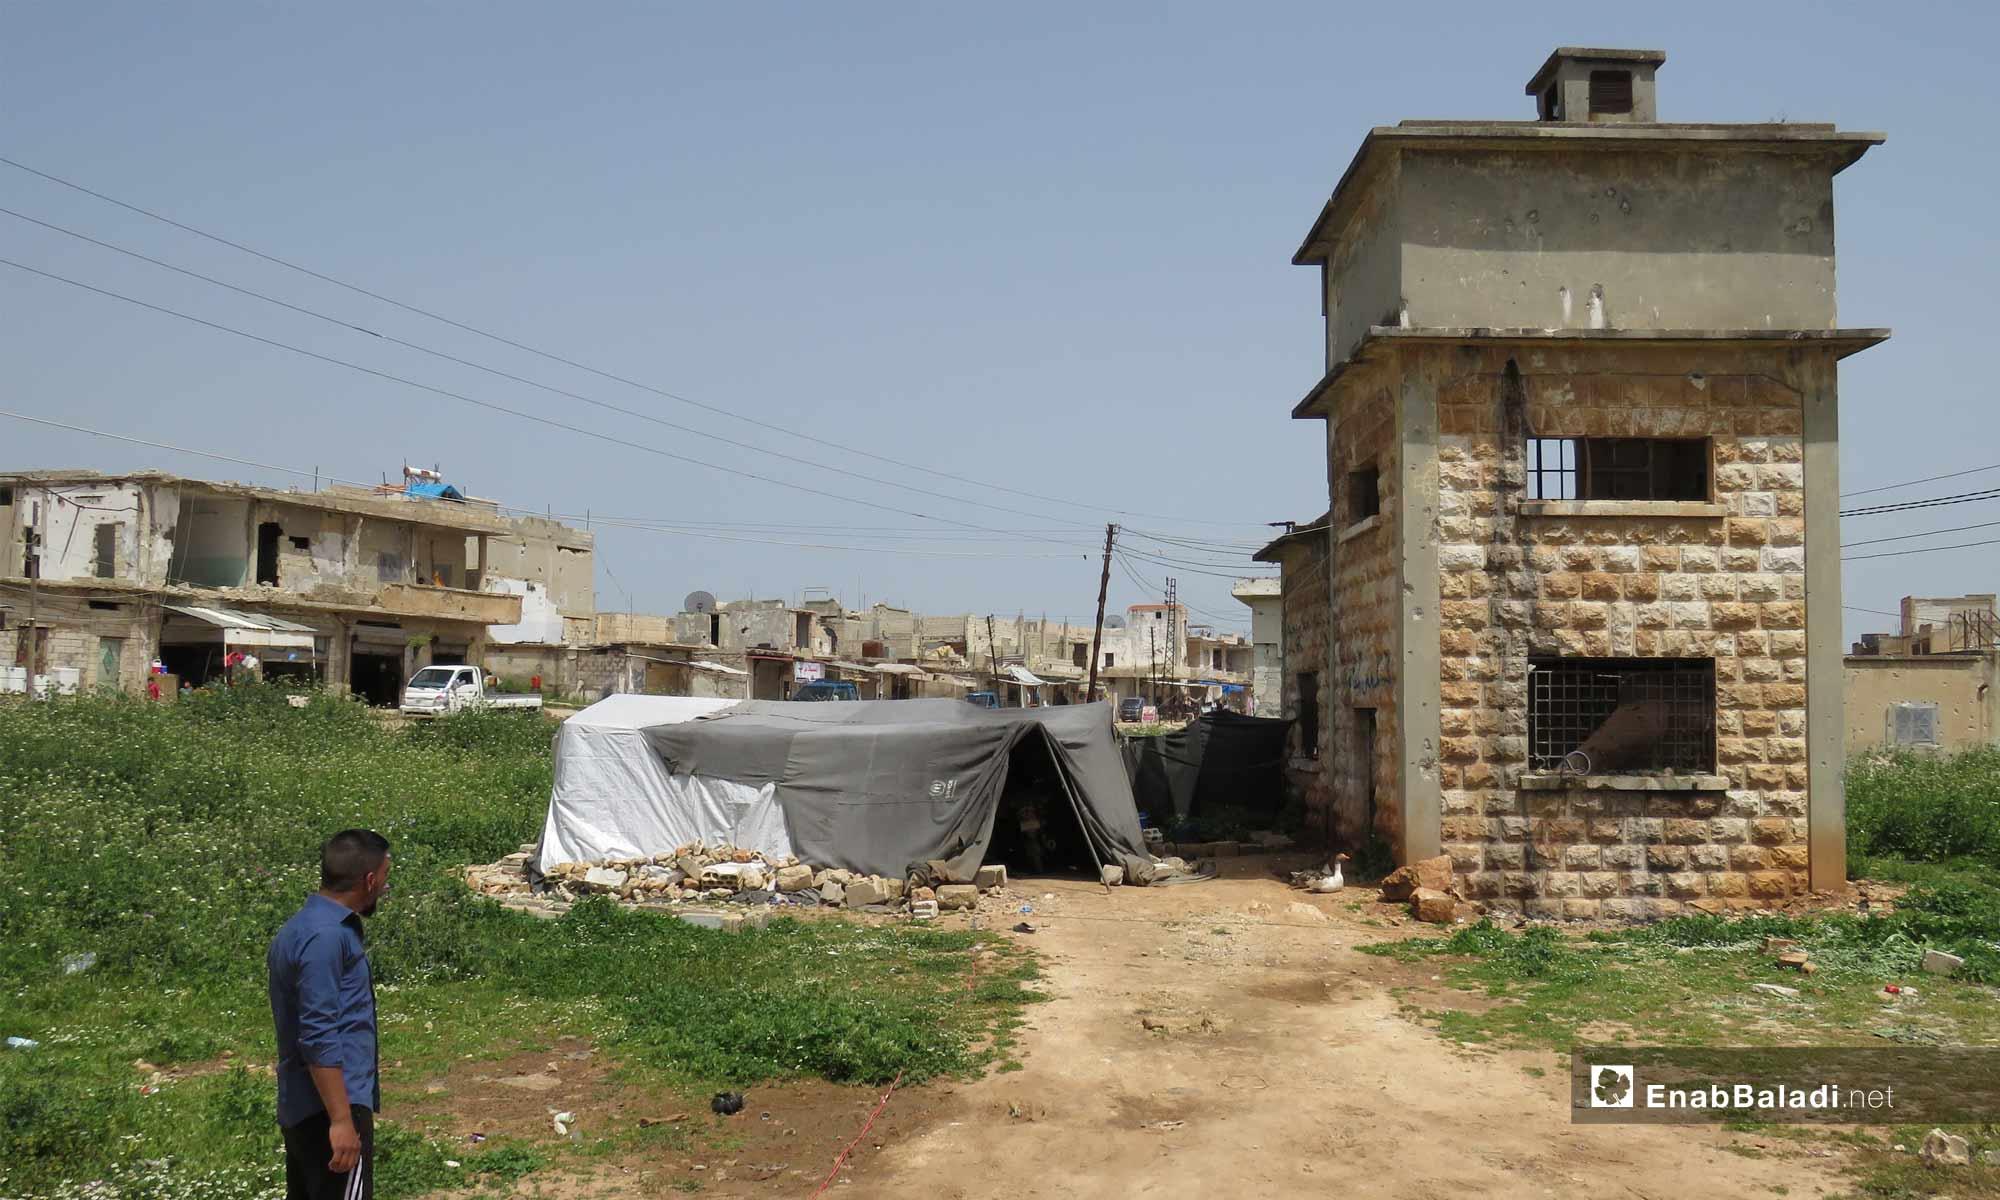 The town of Kafr Nabudah, northern rural Hama – April 24, 2019 (Enab Baladi)